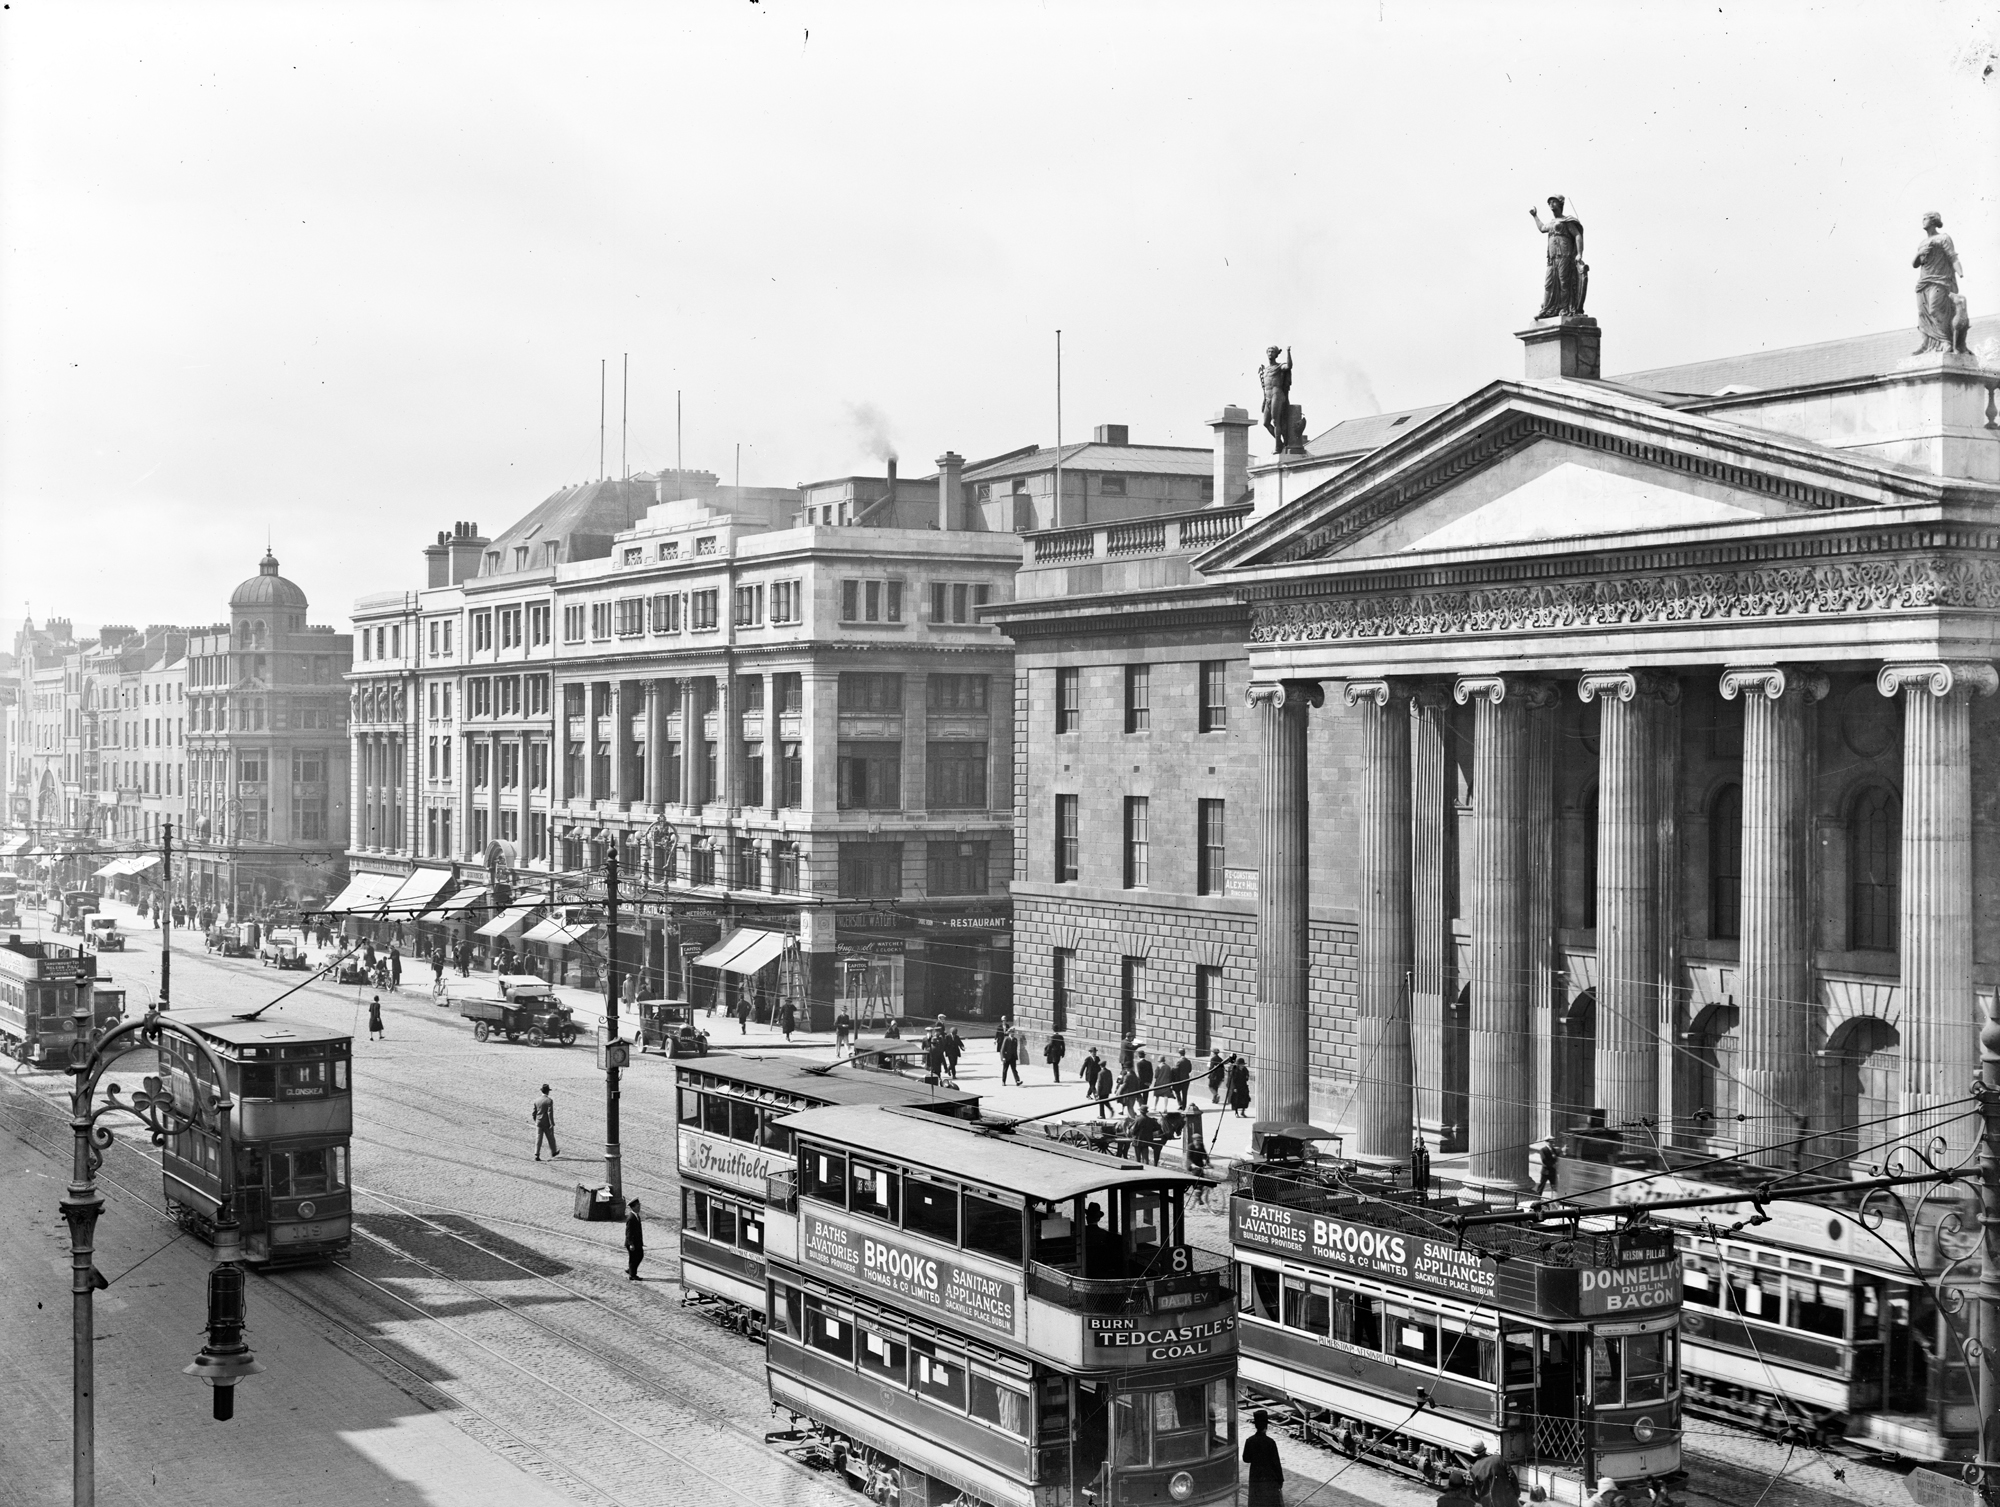 General Post Office, O'Connell Street, Dublin City, Co. Dublin